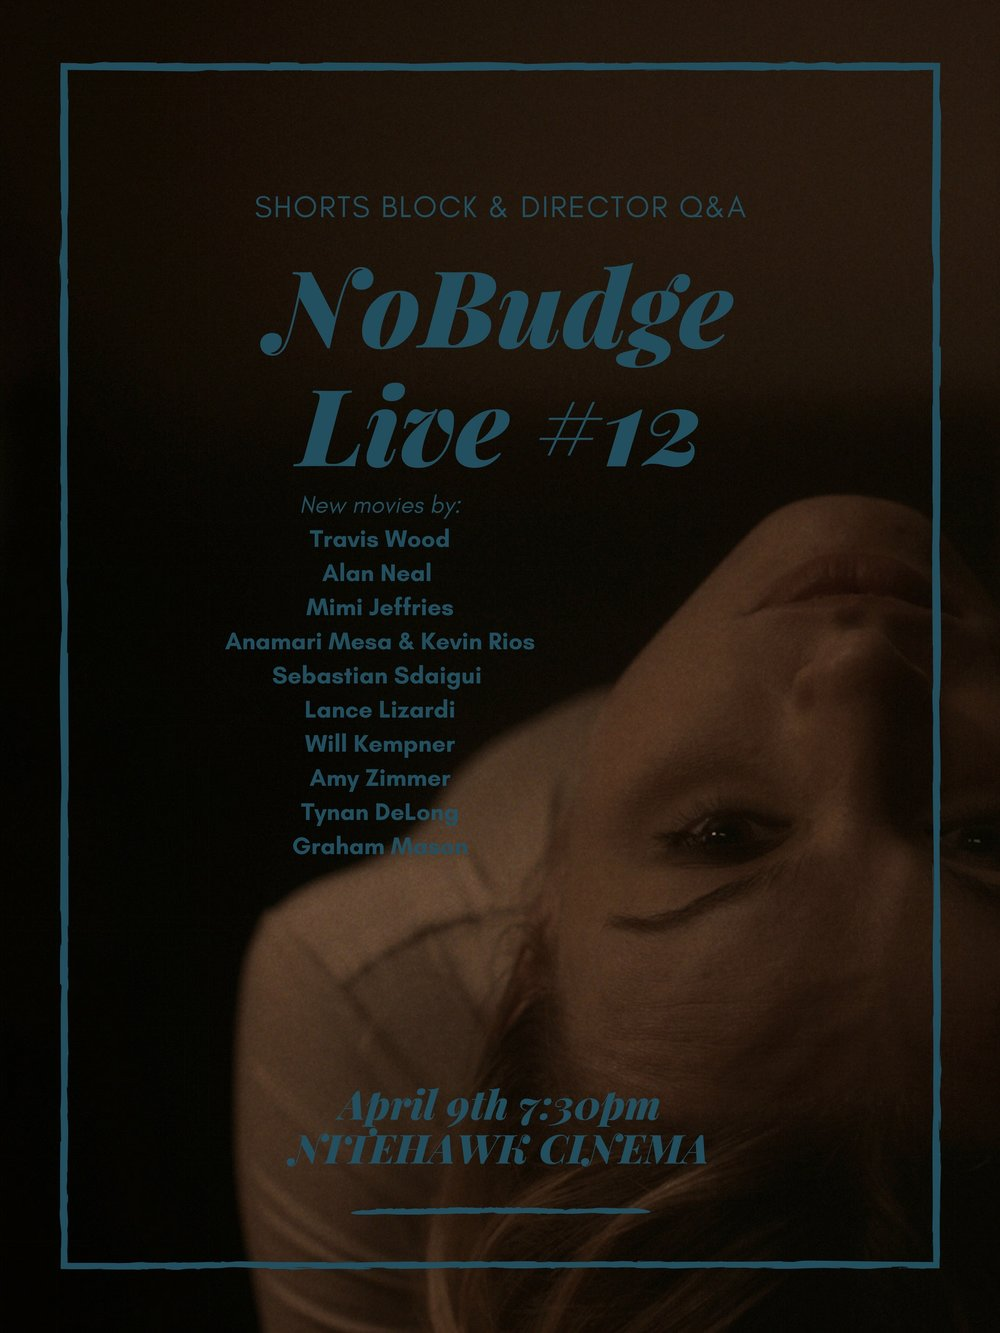 NoBudge Live #12 POSTER.jpg